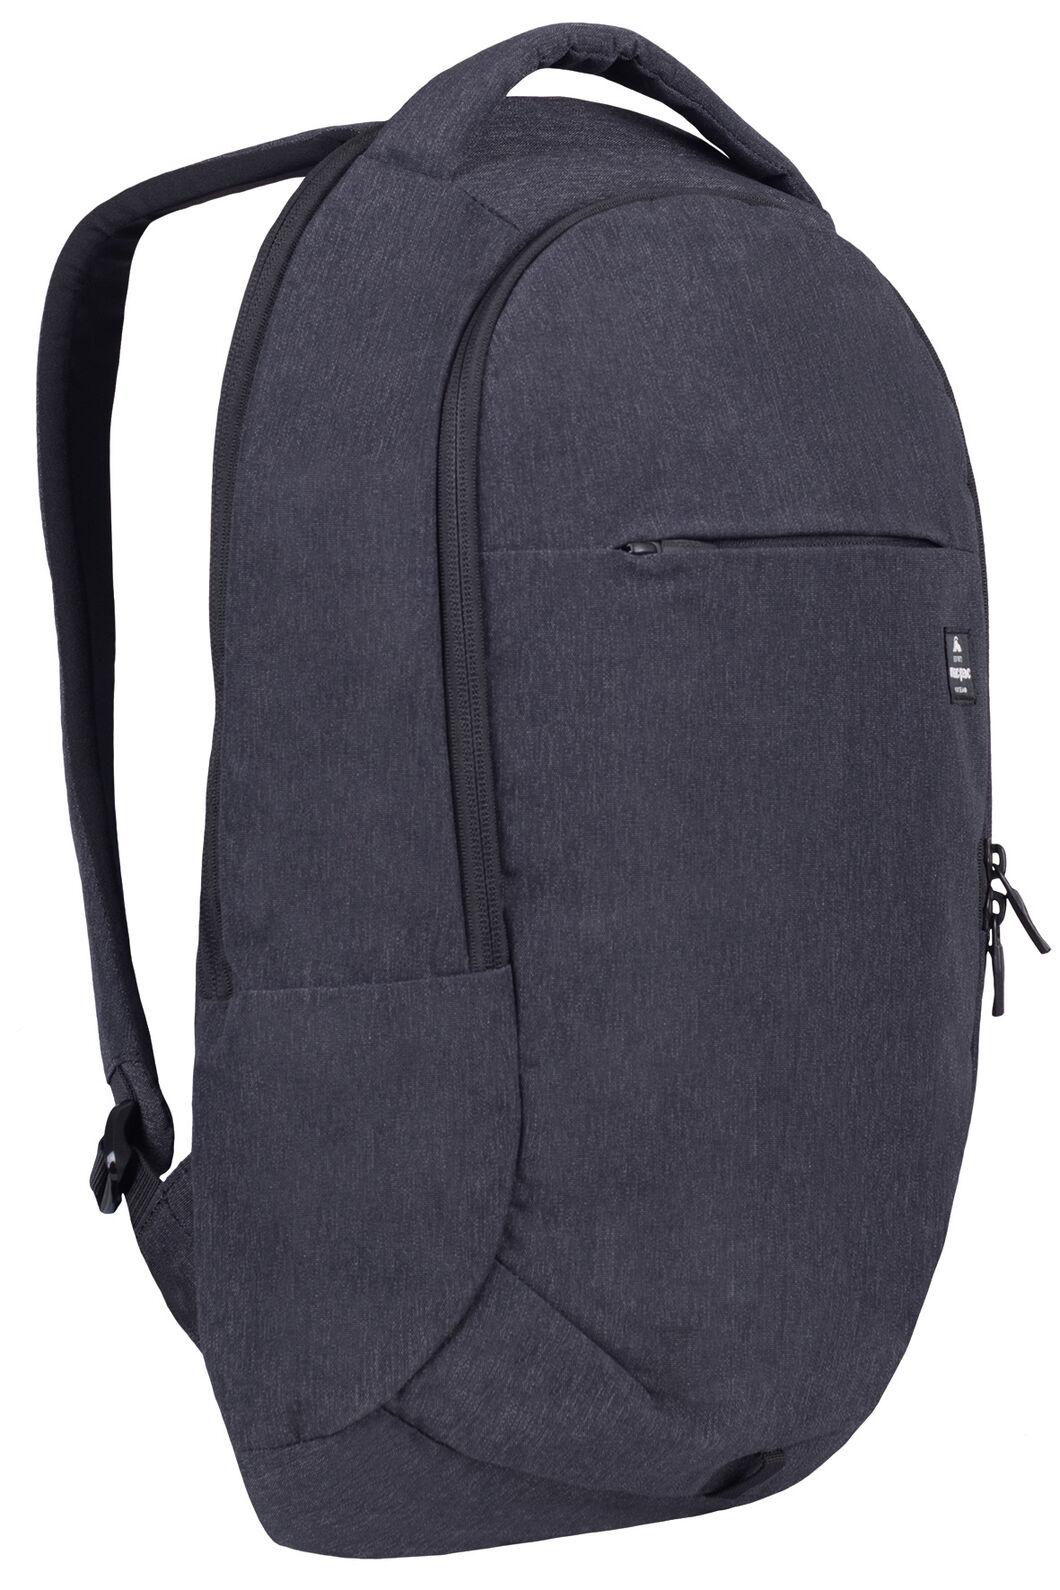 Macpac Slim 15L Backpack, Black, hi-res